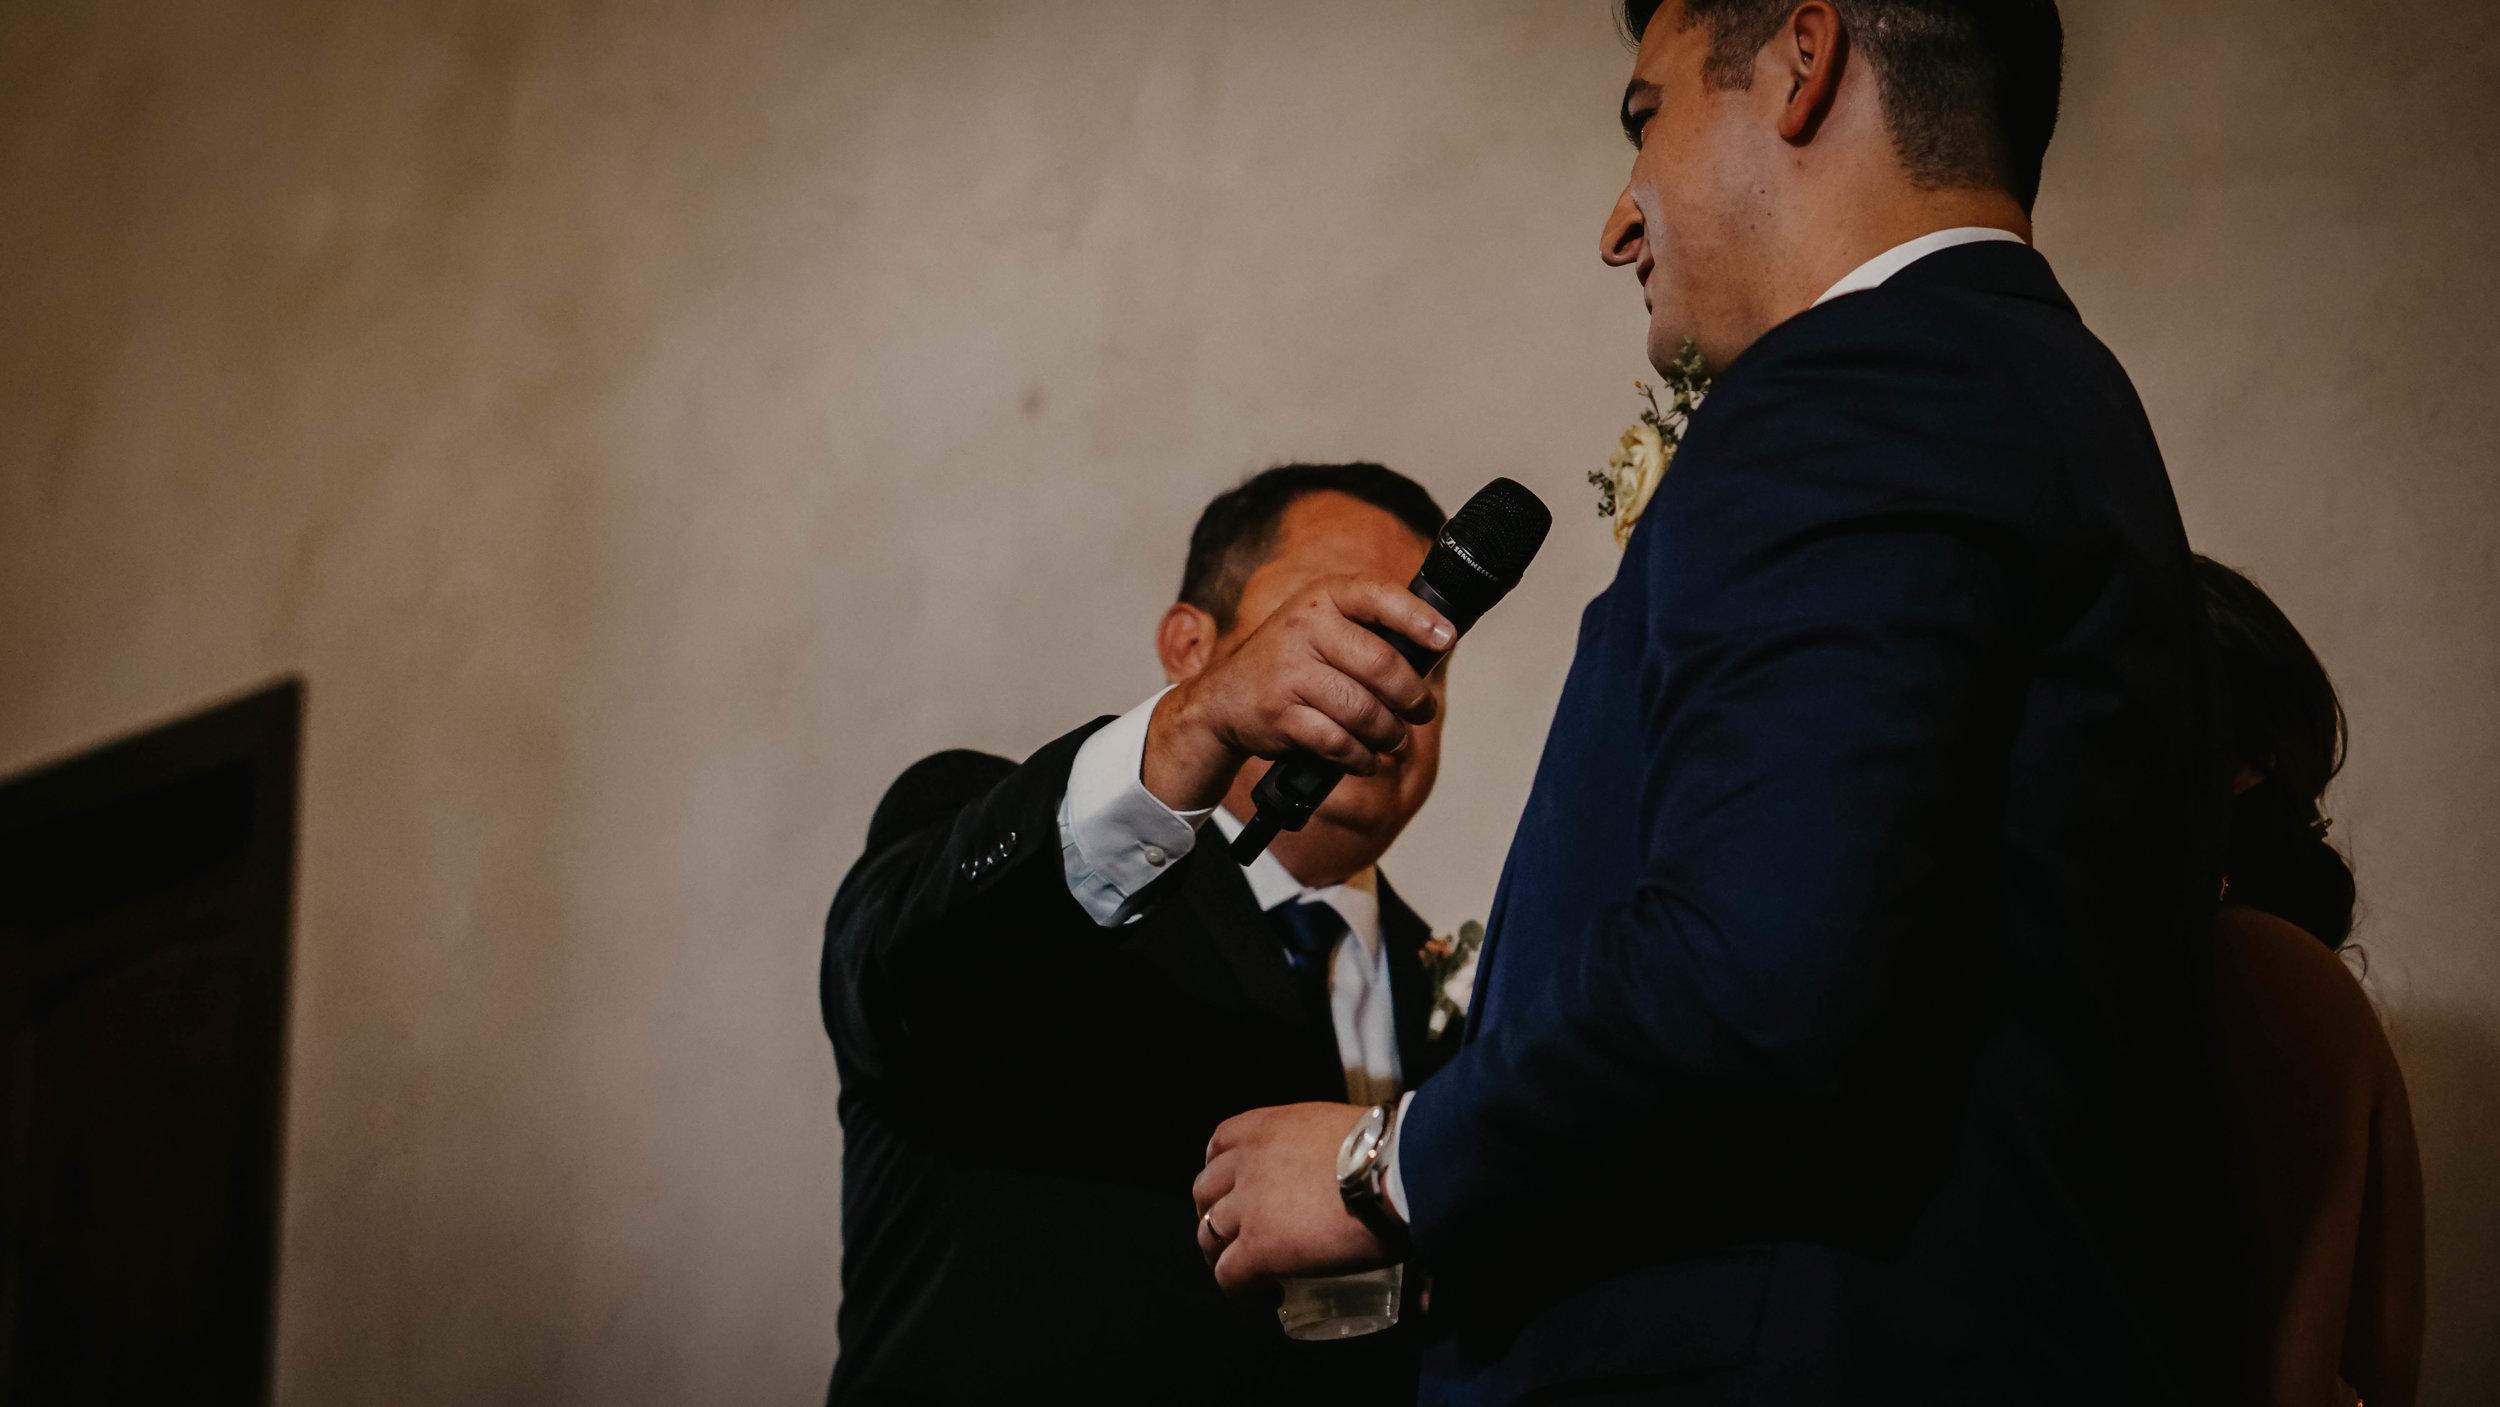 austin-wedding-videographer (96 of 999).jpg